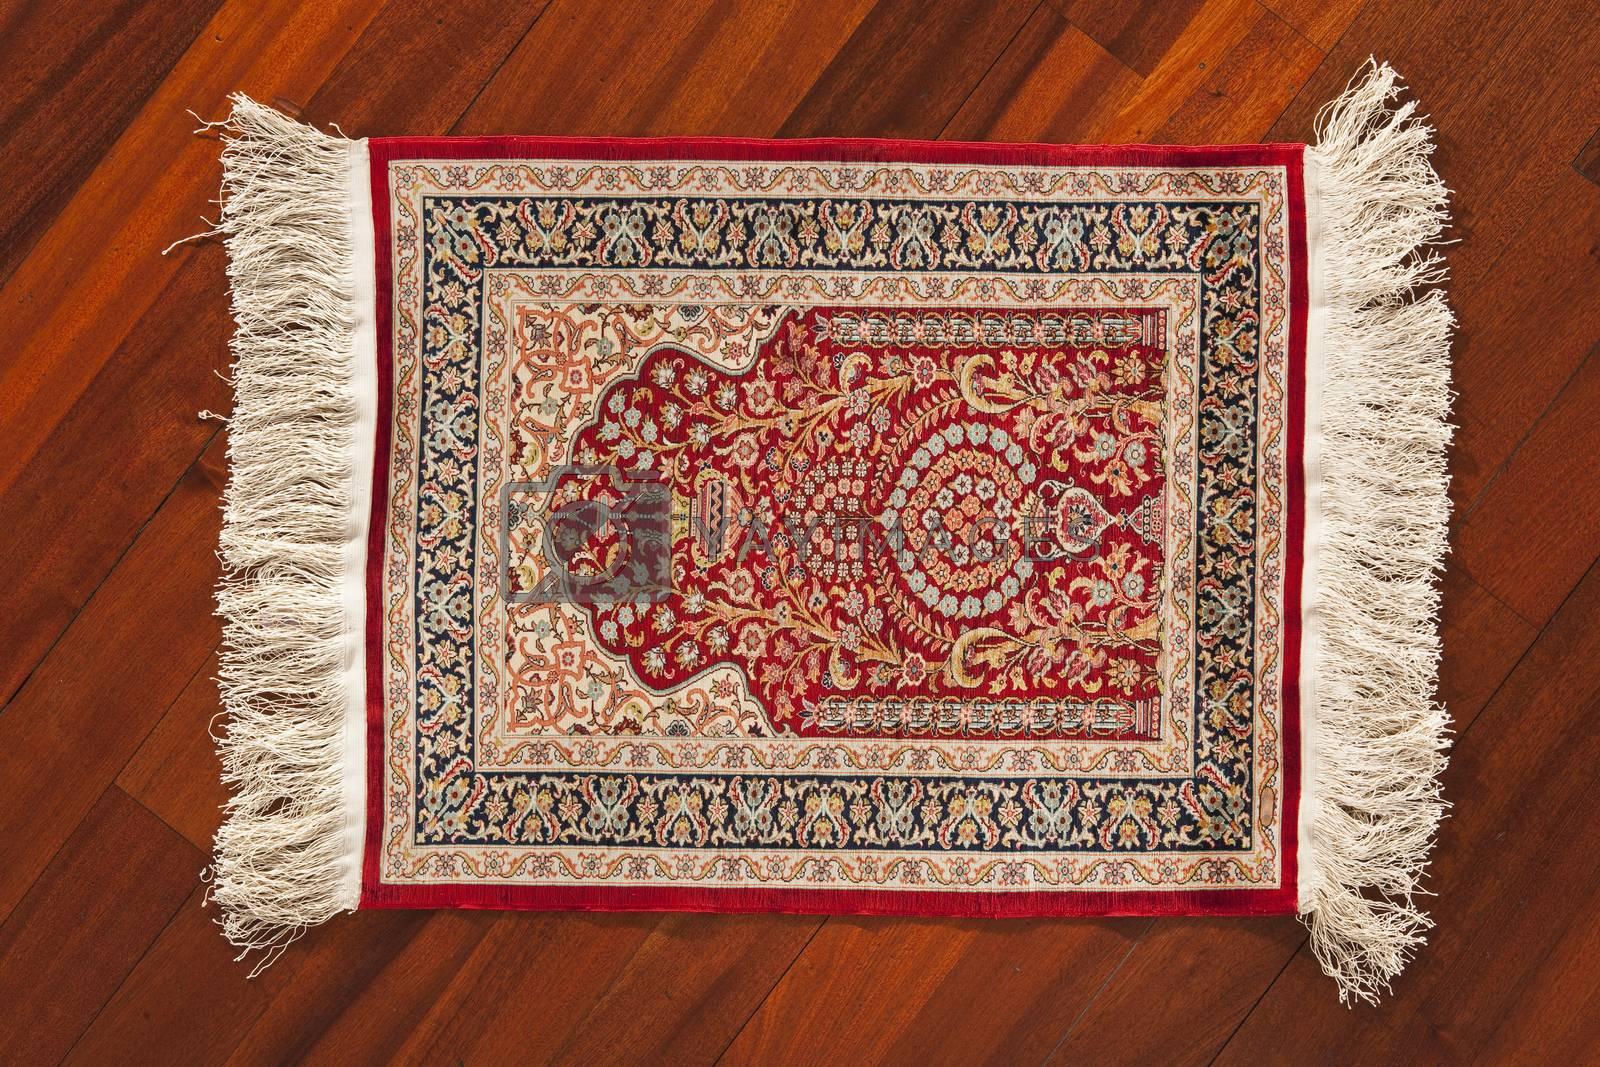 Royalty free image of turkish carpet by emirkoo